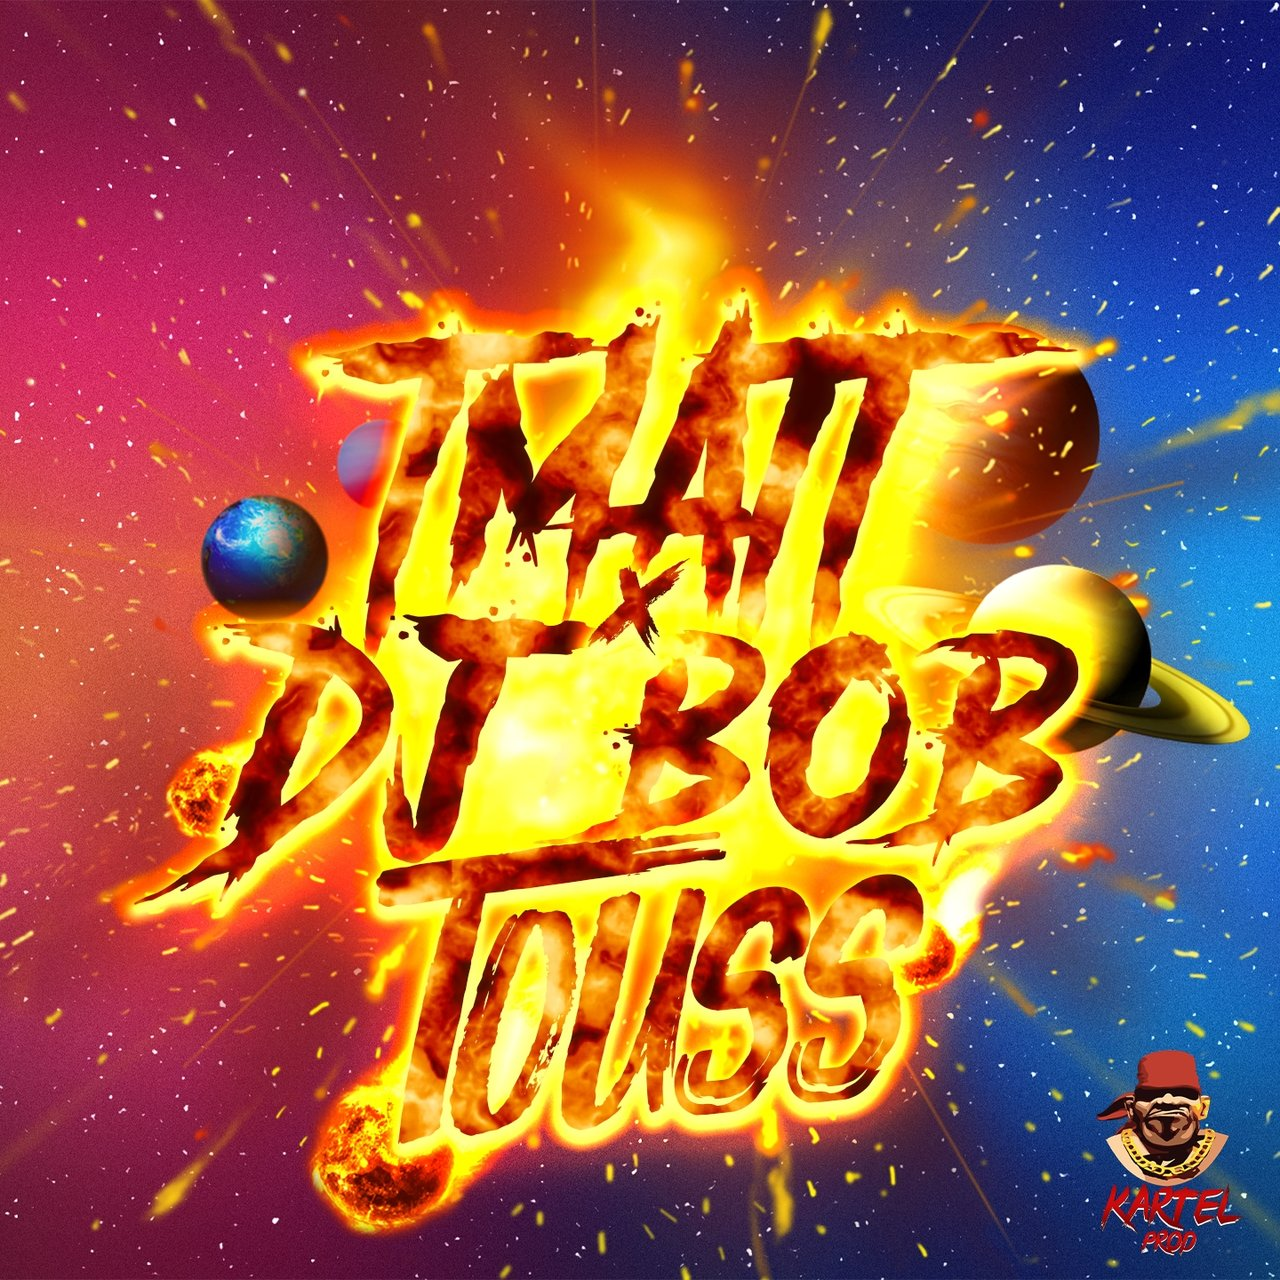 T-Matt and DJ Bob - Touss (Cover)